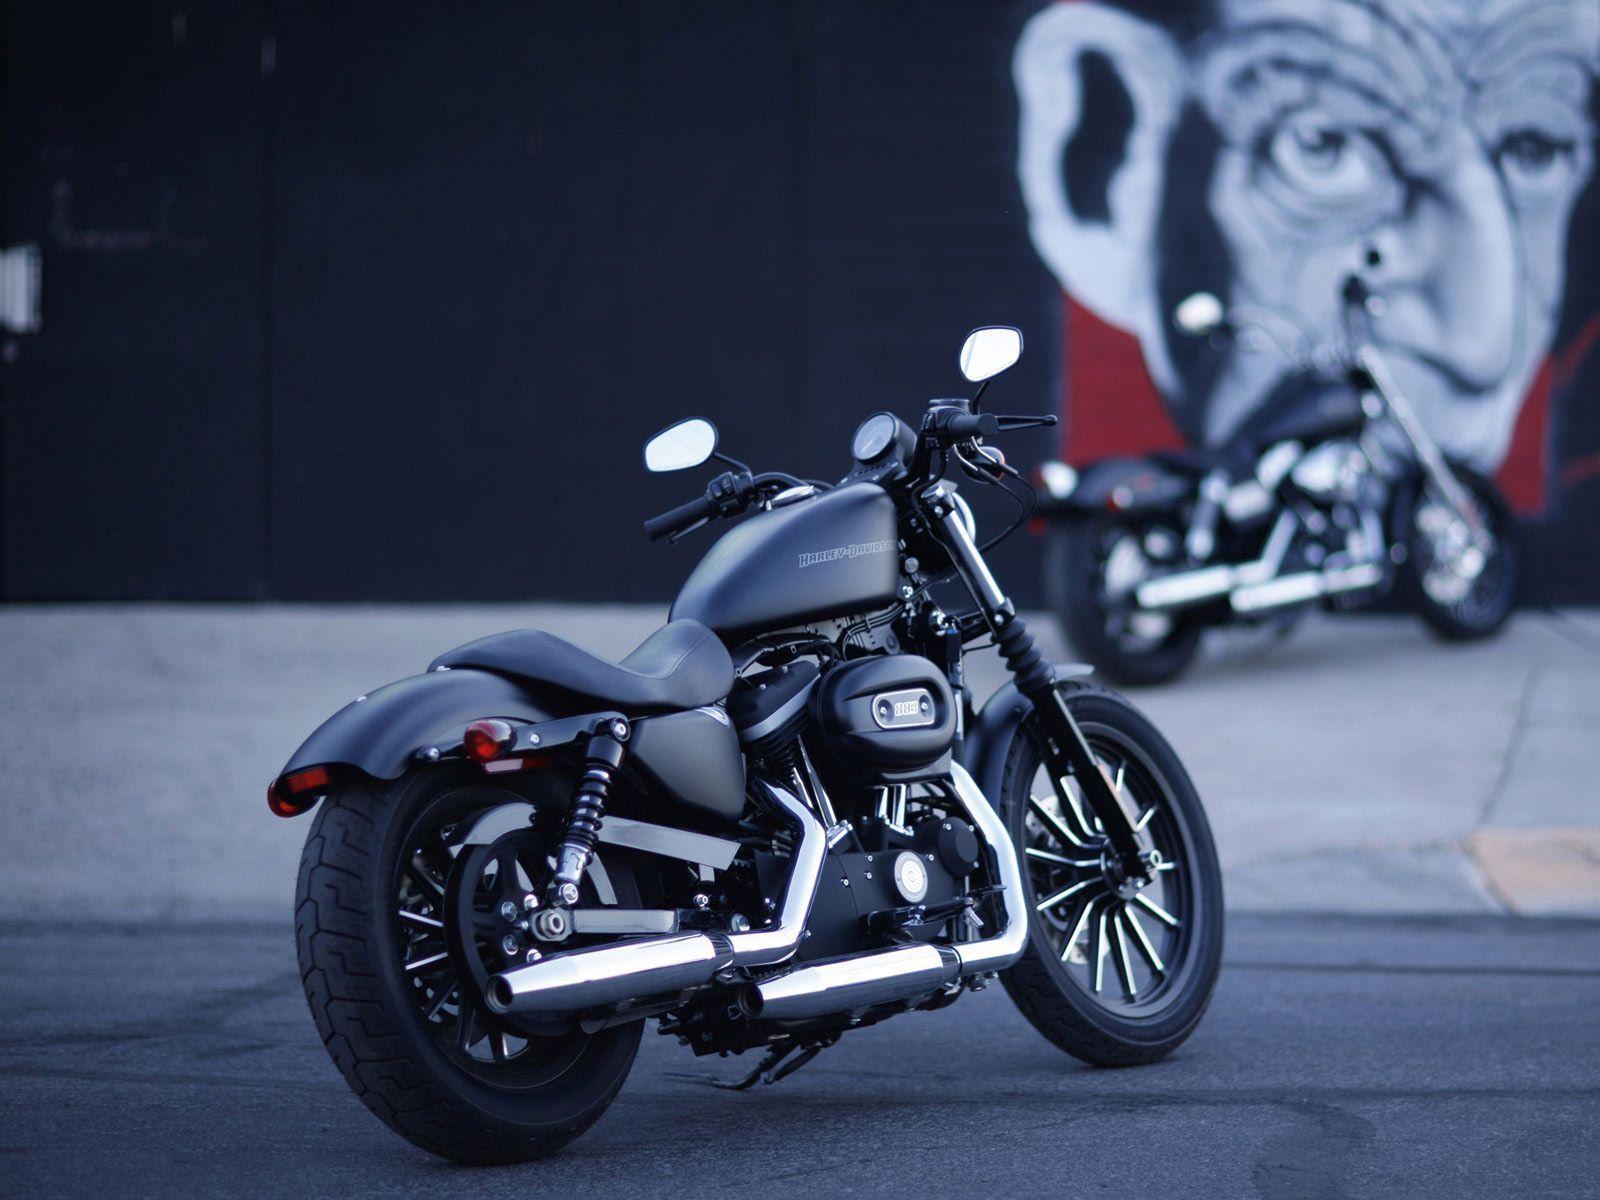 Beautiful Wallpaper High Resolution Harley Davidson - 29ff53e524bd61c771a67e639b60ec86  Picture_245889.jpg